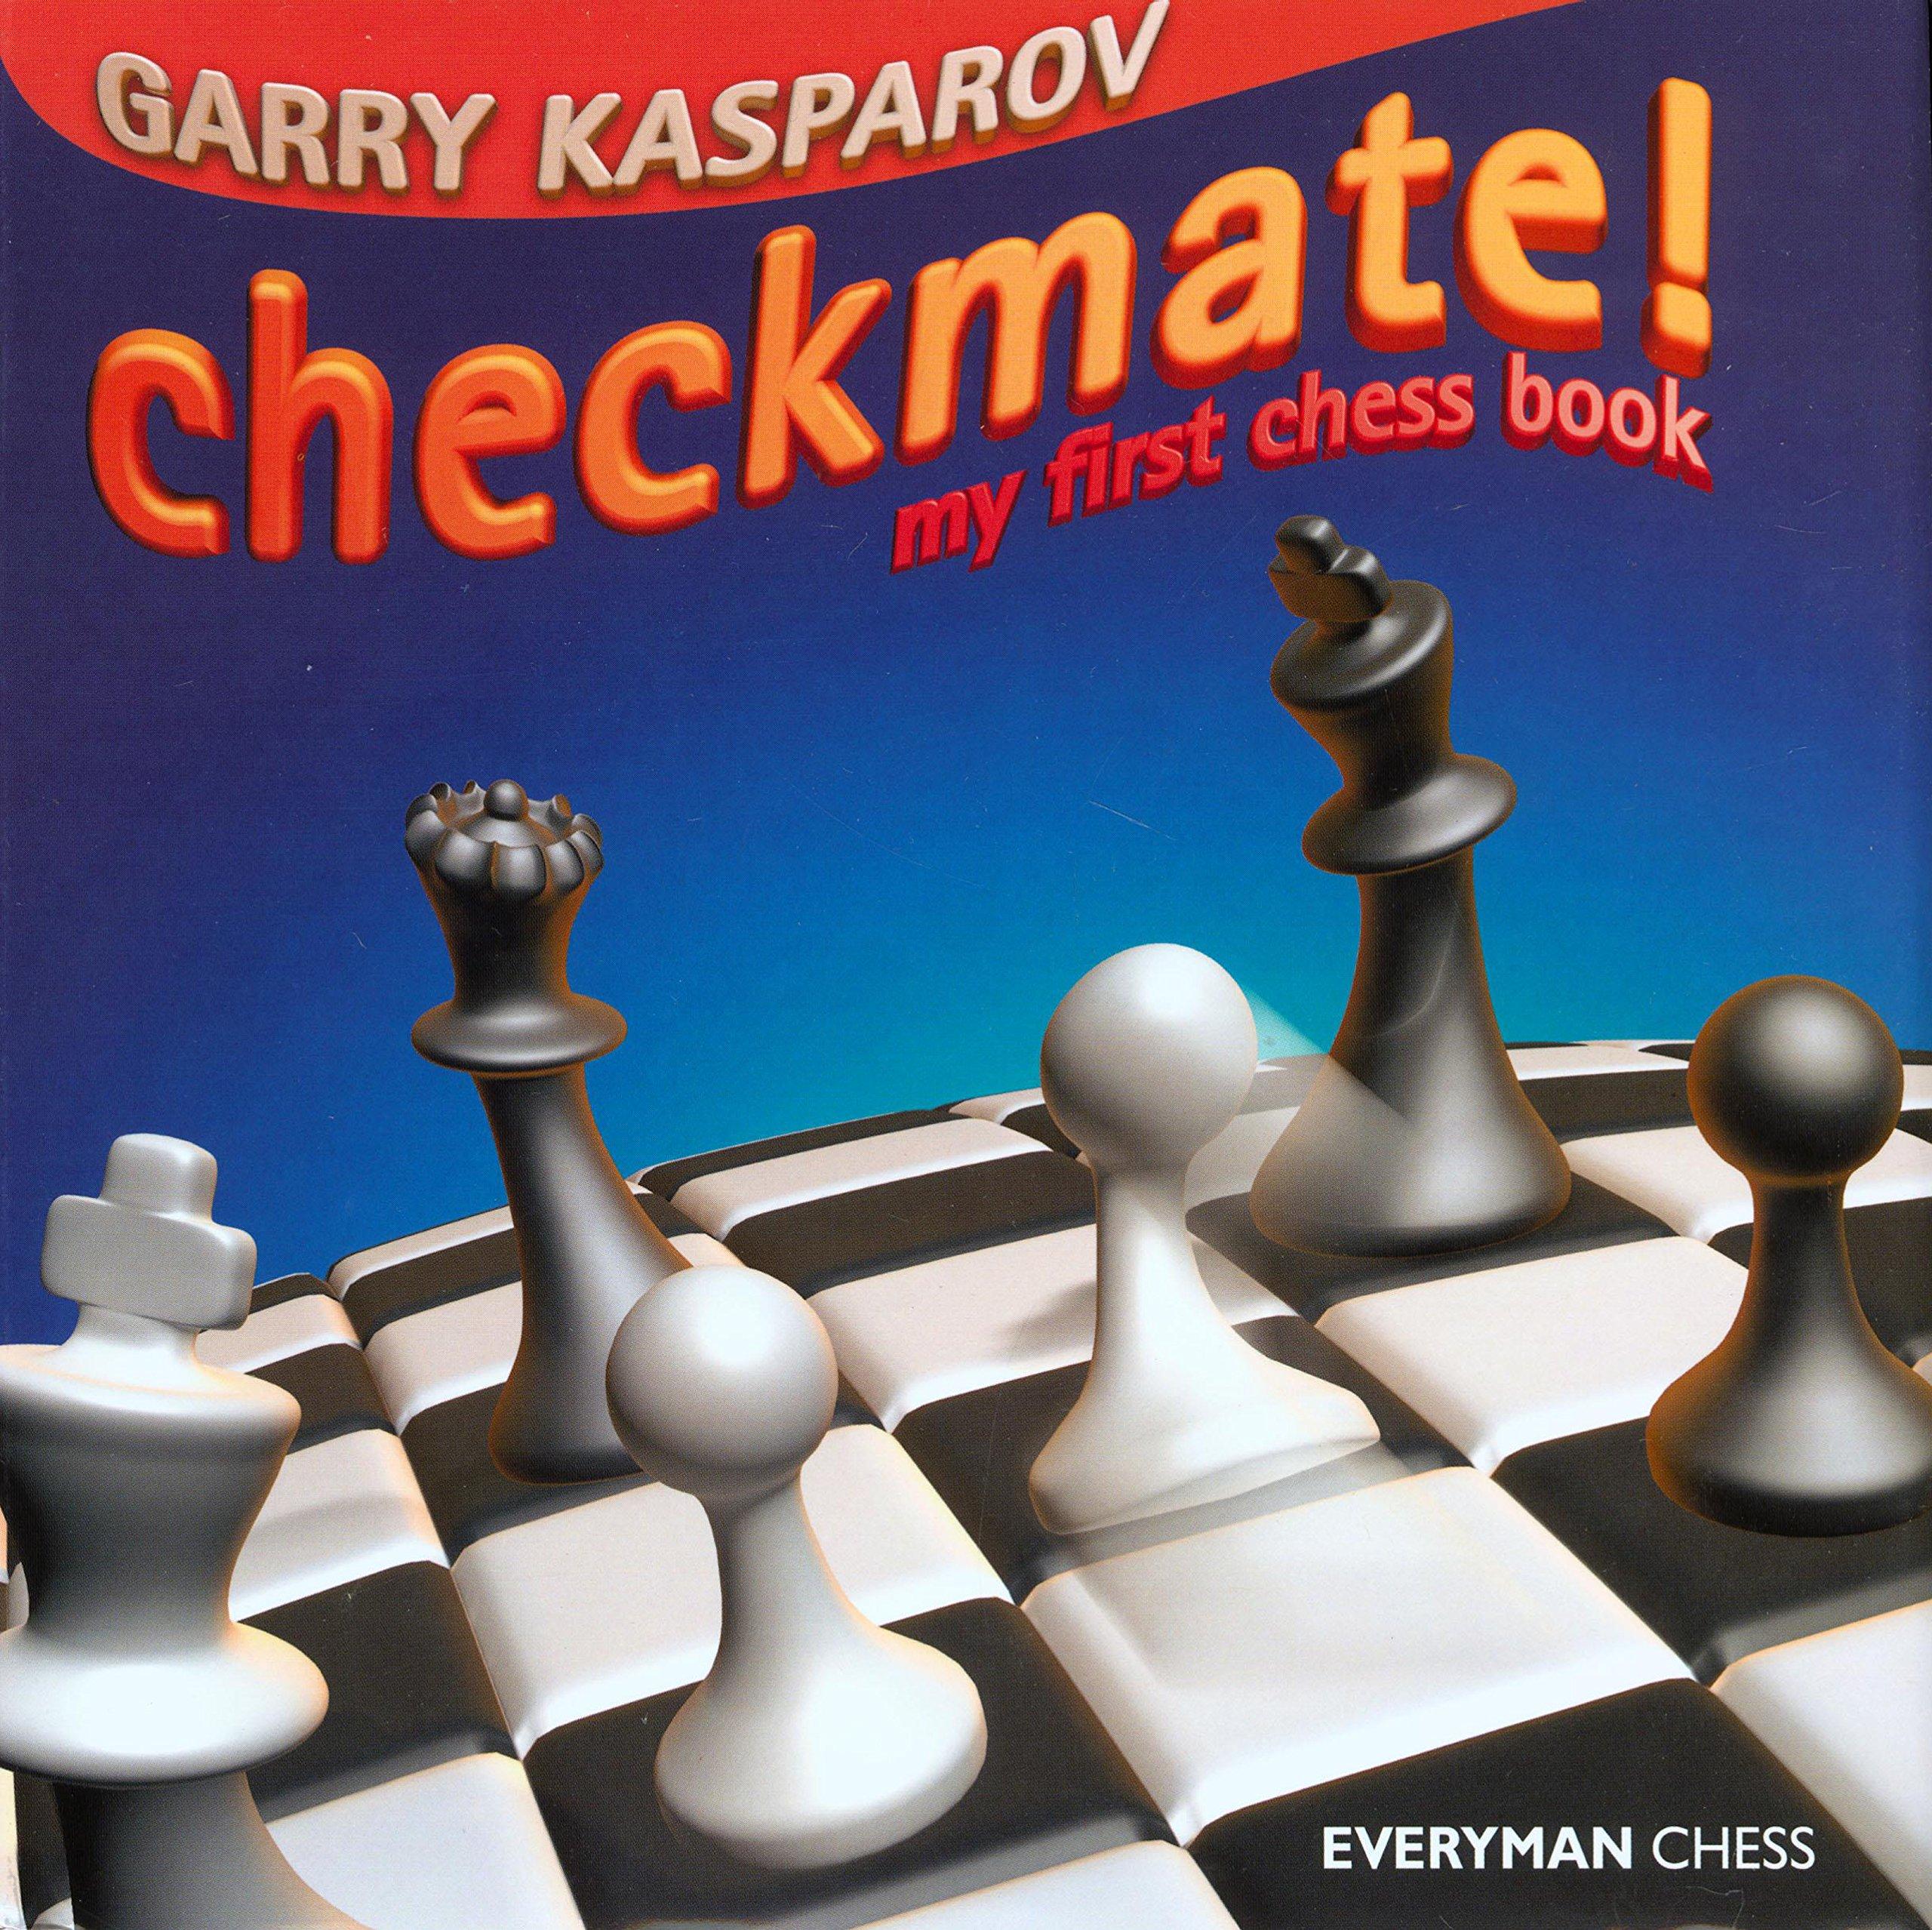 What's a good beginner's chess book? : chess - reddit